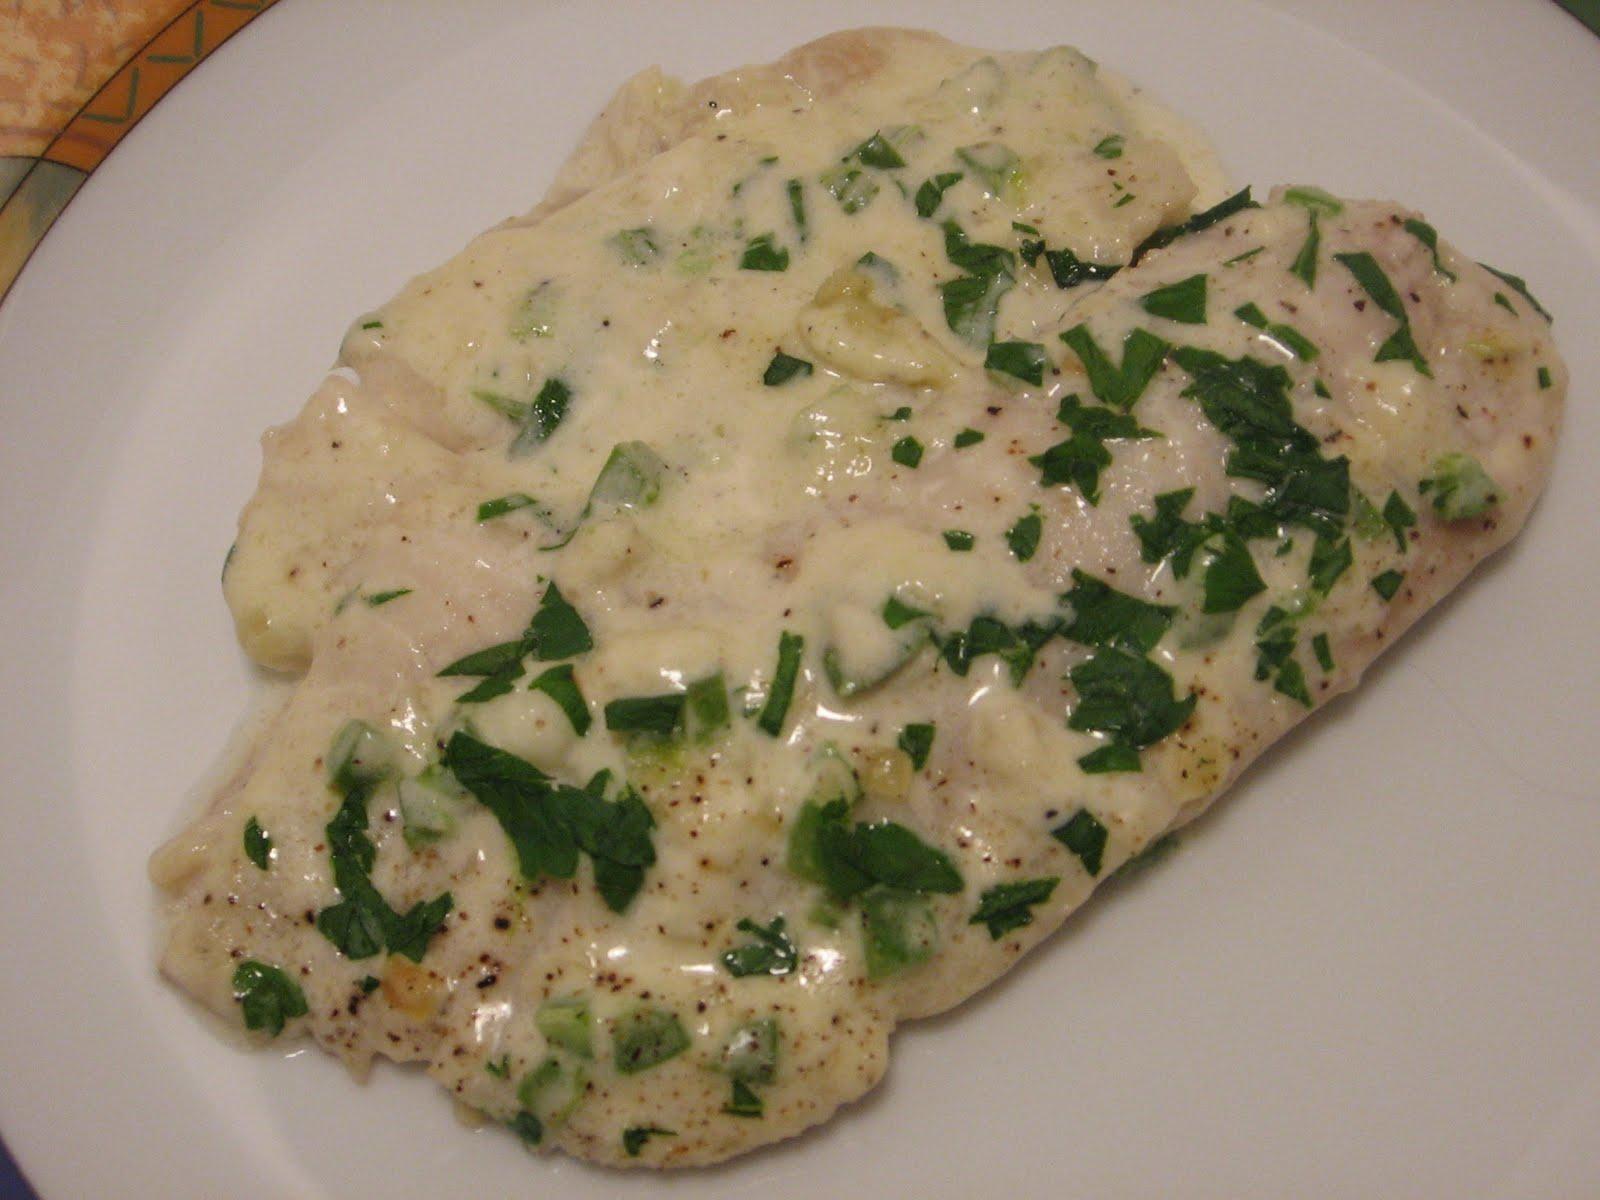 Jenns food journey tilapia in jalapeno cream sauce tilapia in jalapeno cream sauce forumfinder Images